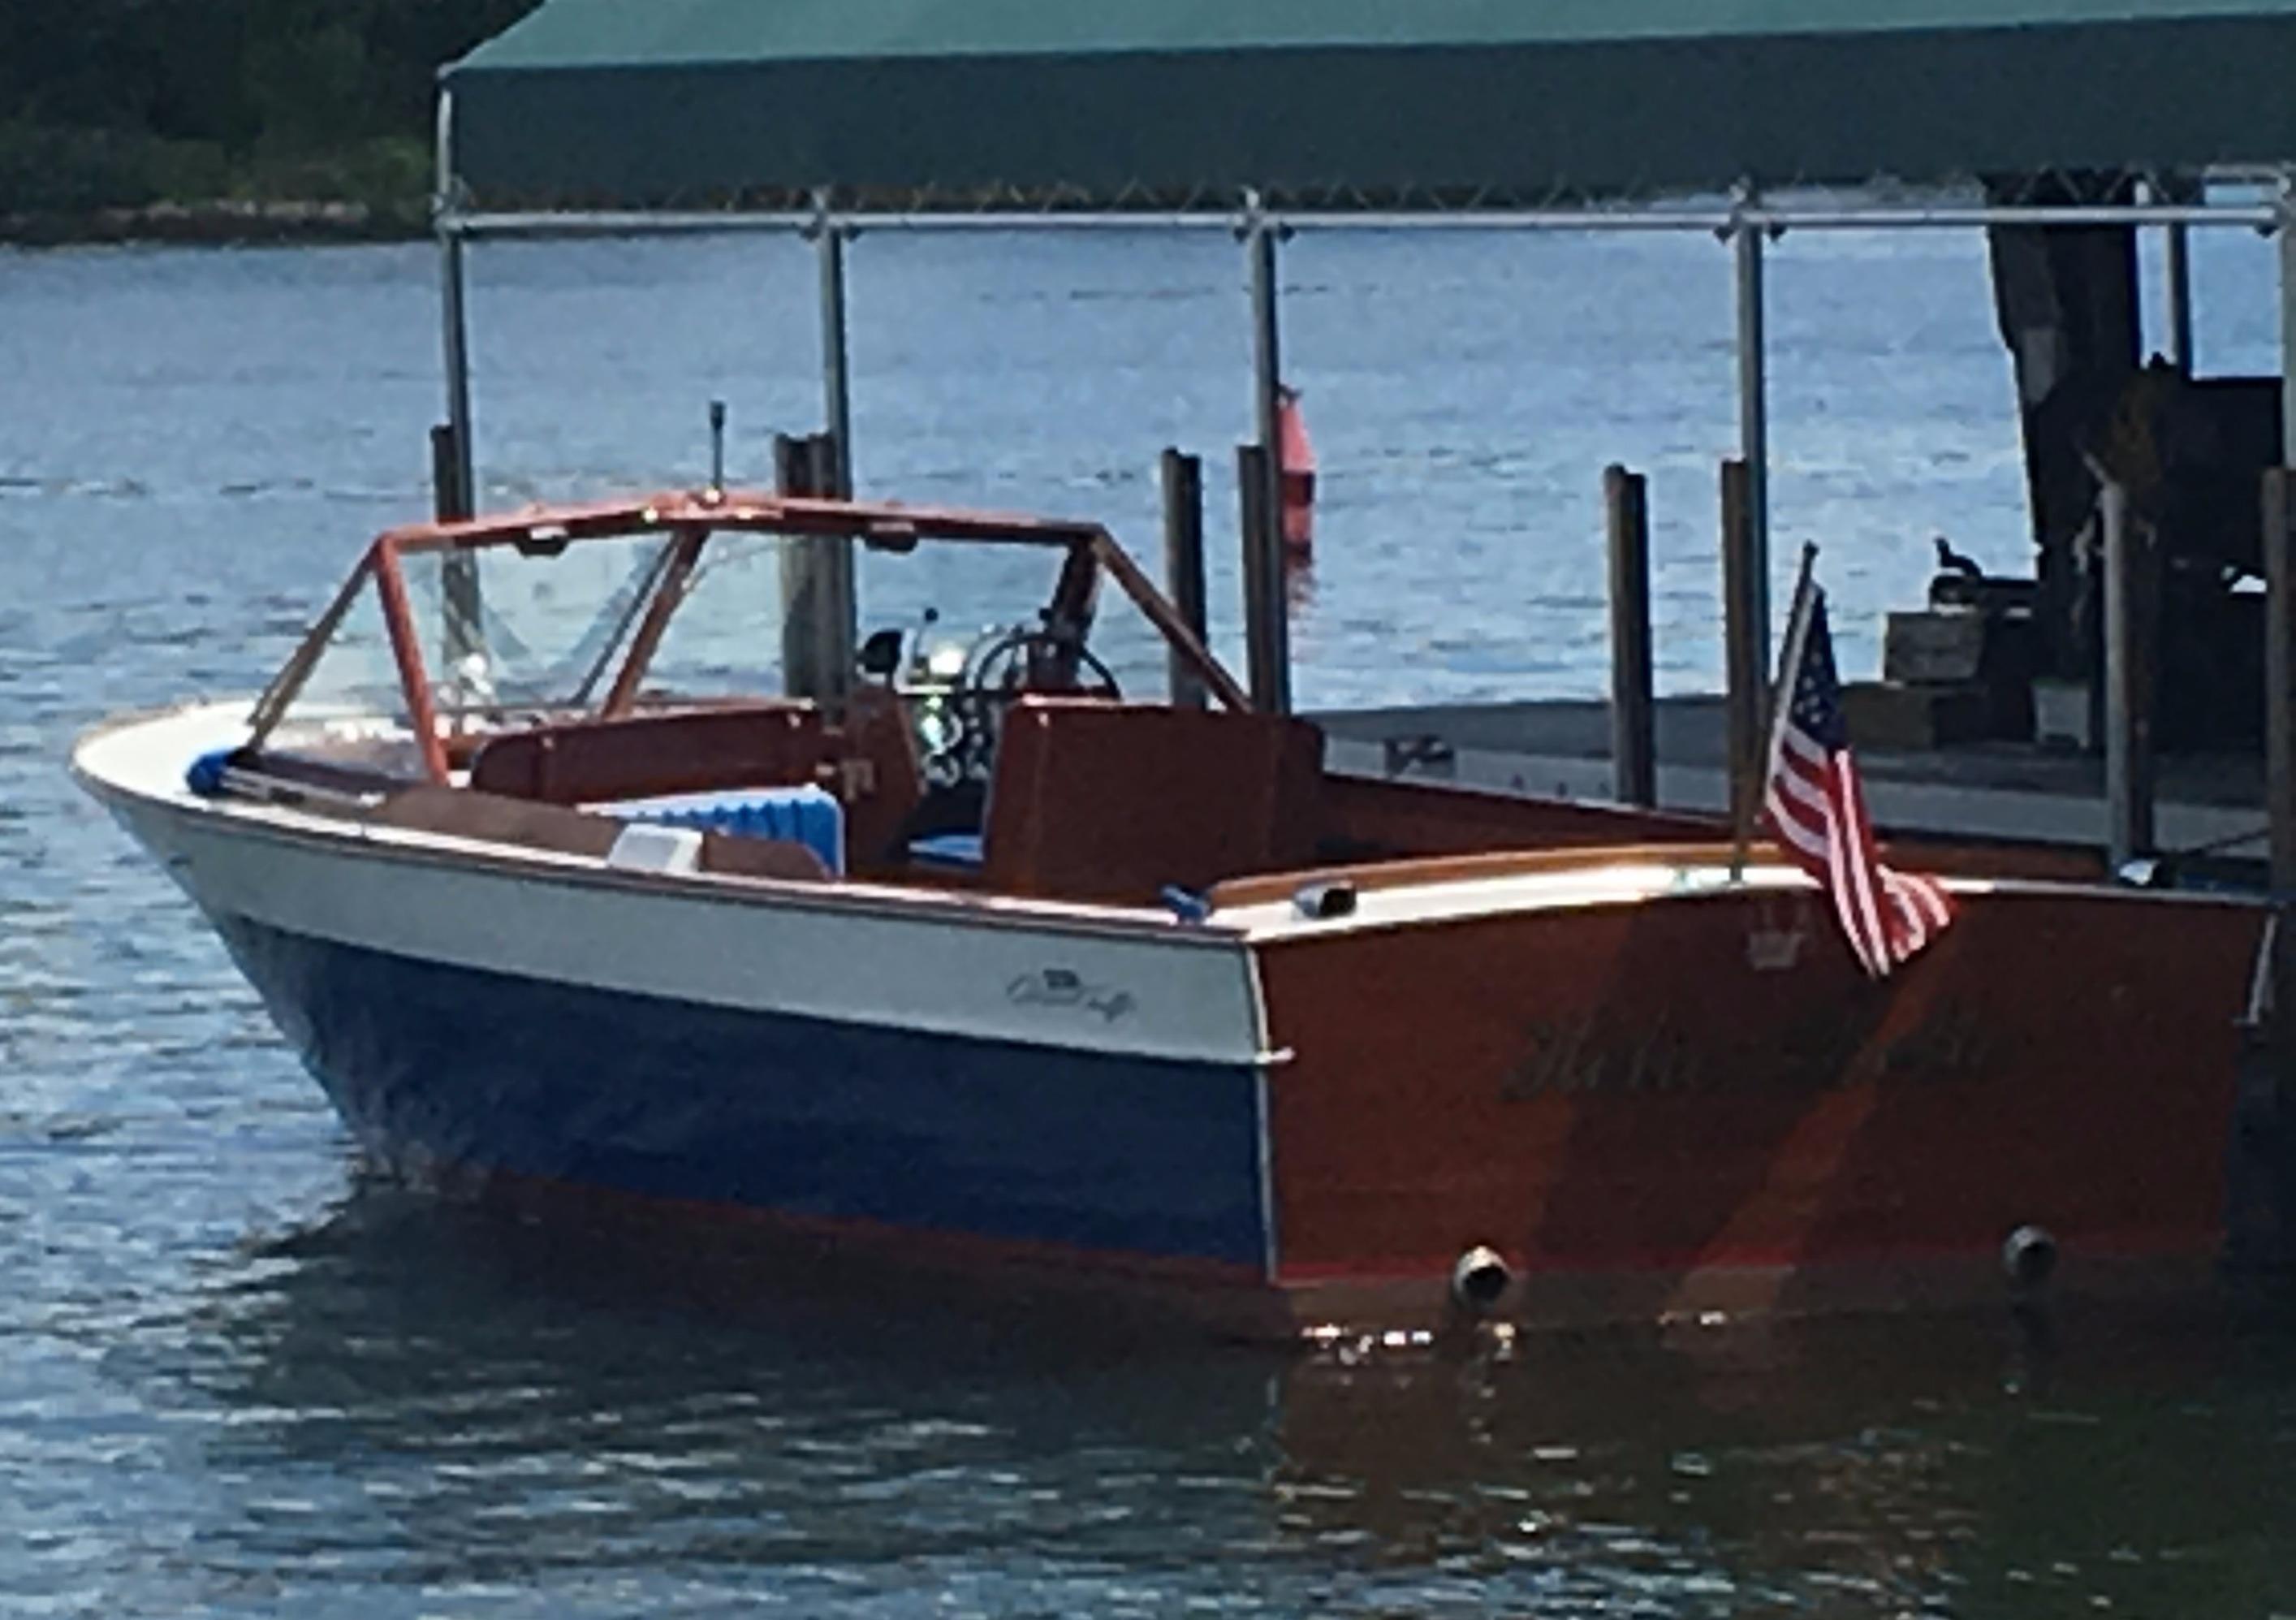 1964 chris craft sea skiff power boat for sale www for Skiff craft boats for sale